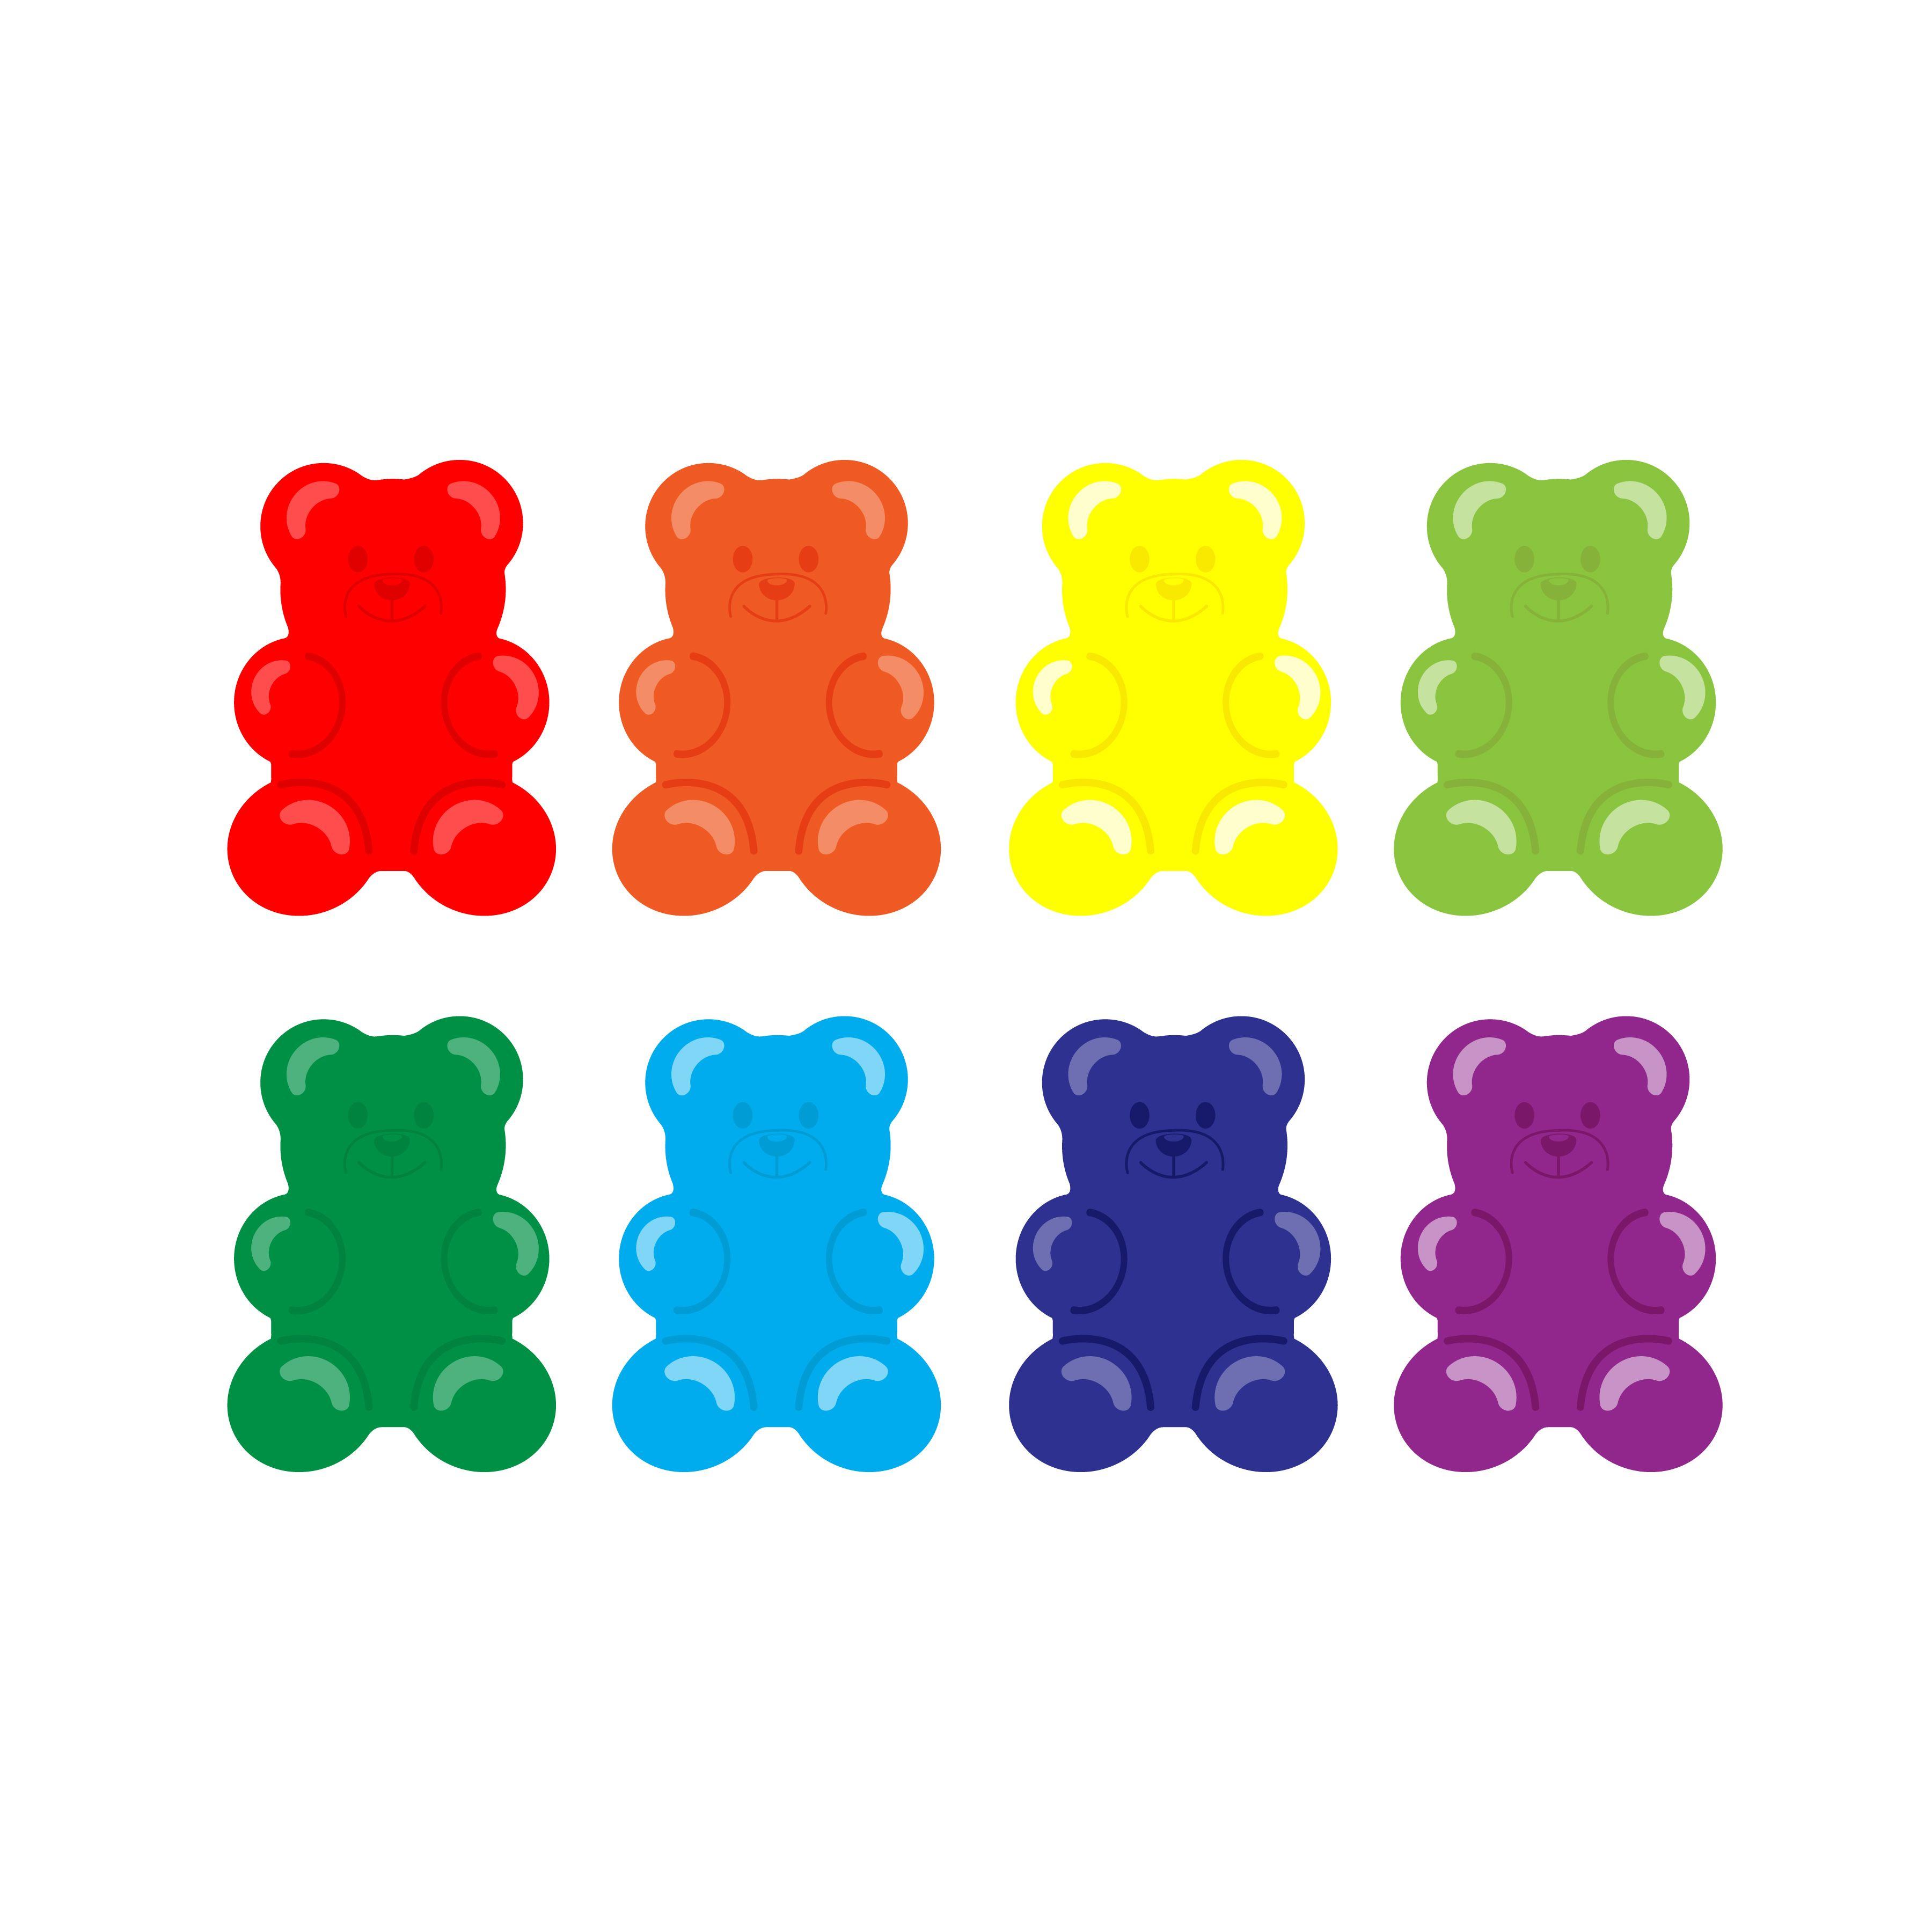 Rainbow Haribo Jelly Bear Gummy Bear 1 Zipped File Including Eps Jpg Png Svg Pdf For Cricut Jelly Bears Gummy Bears Illustration Journal